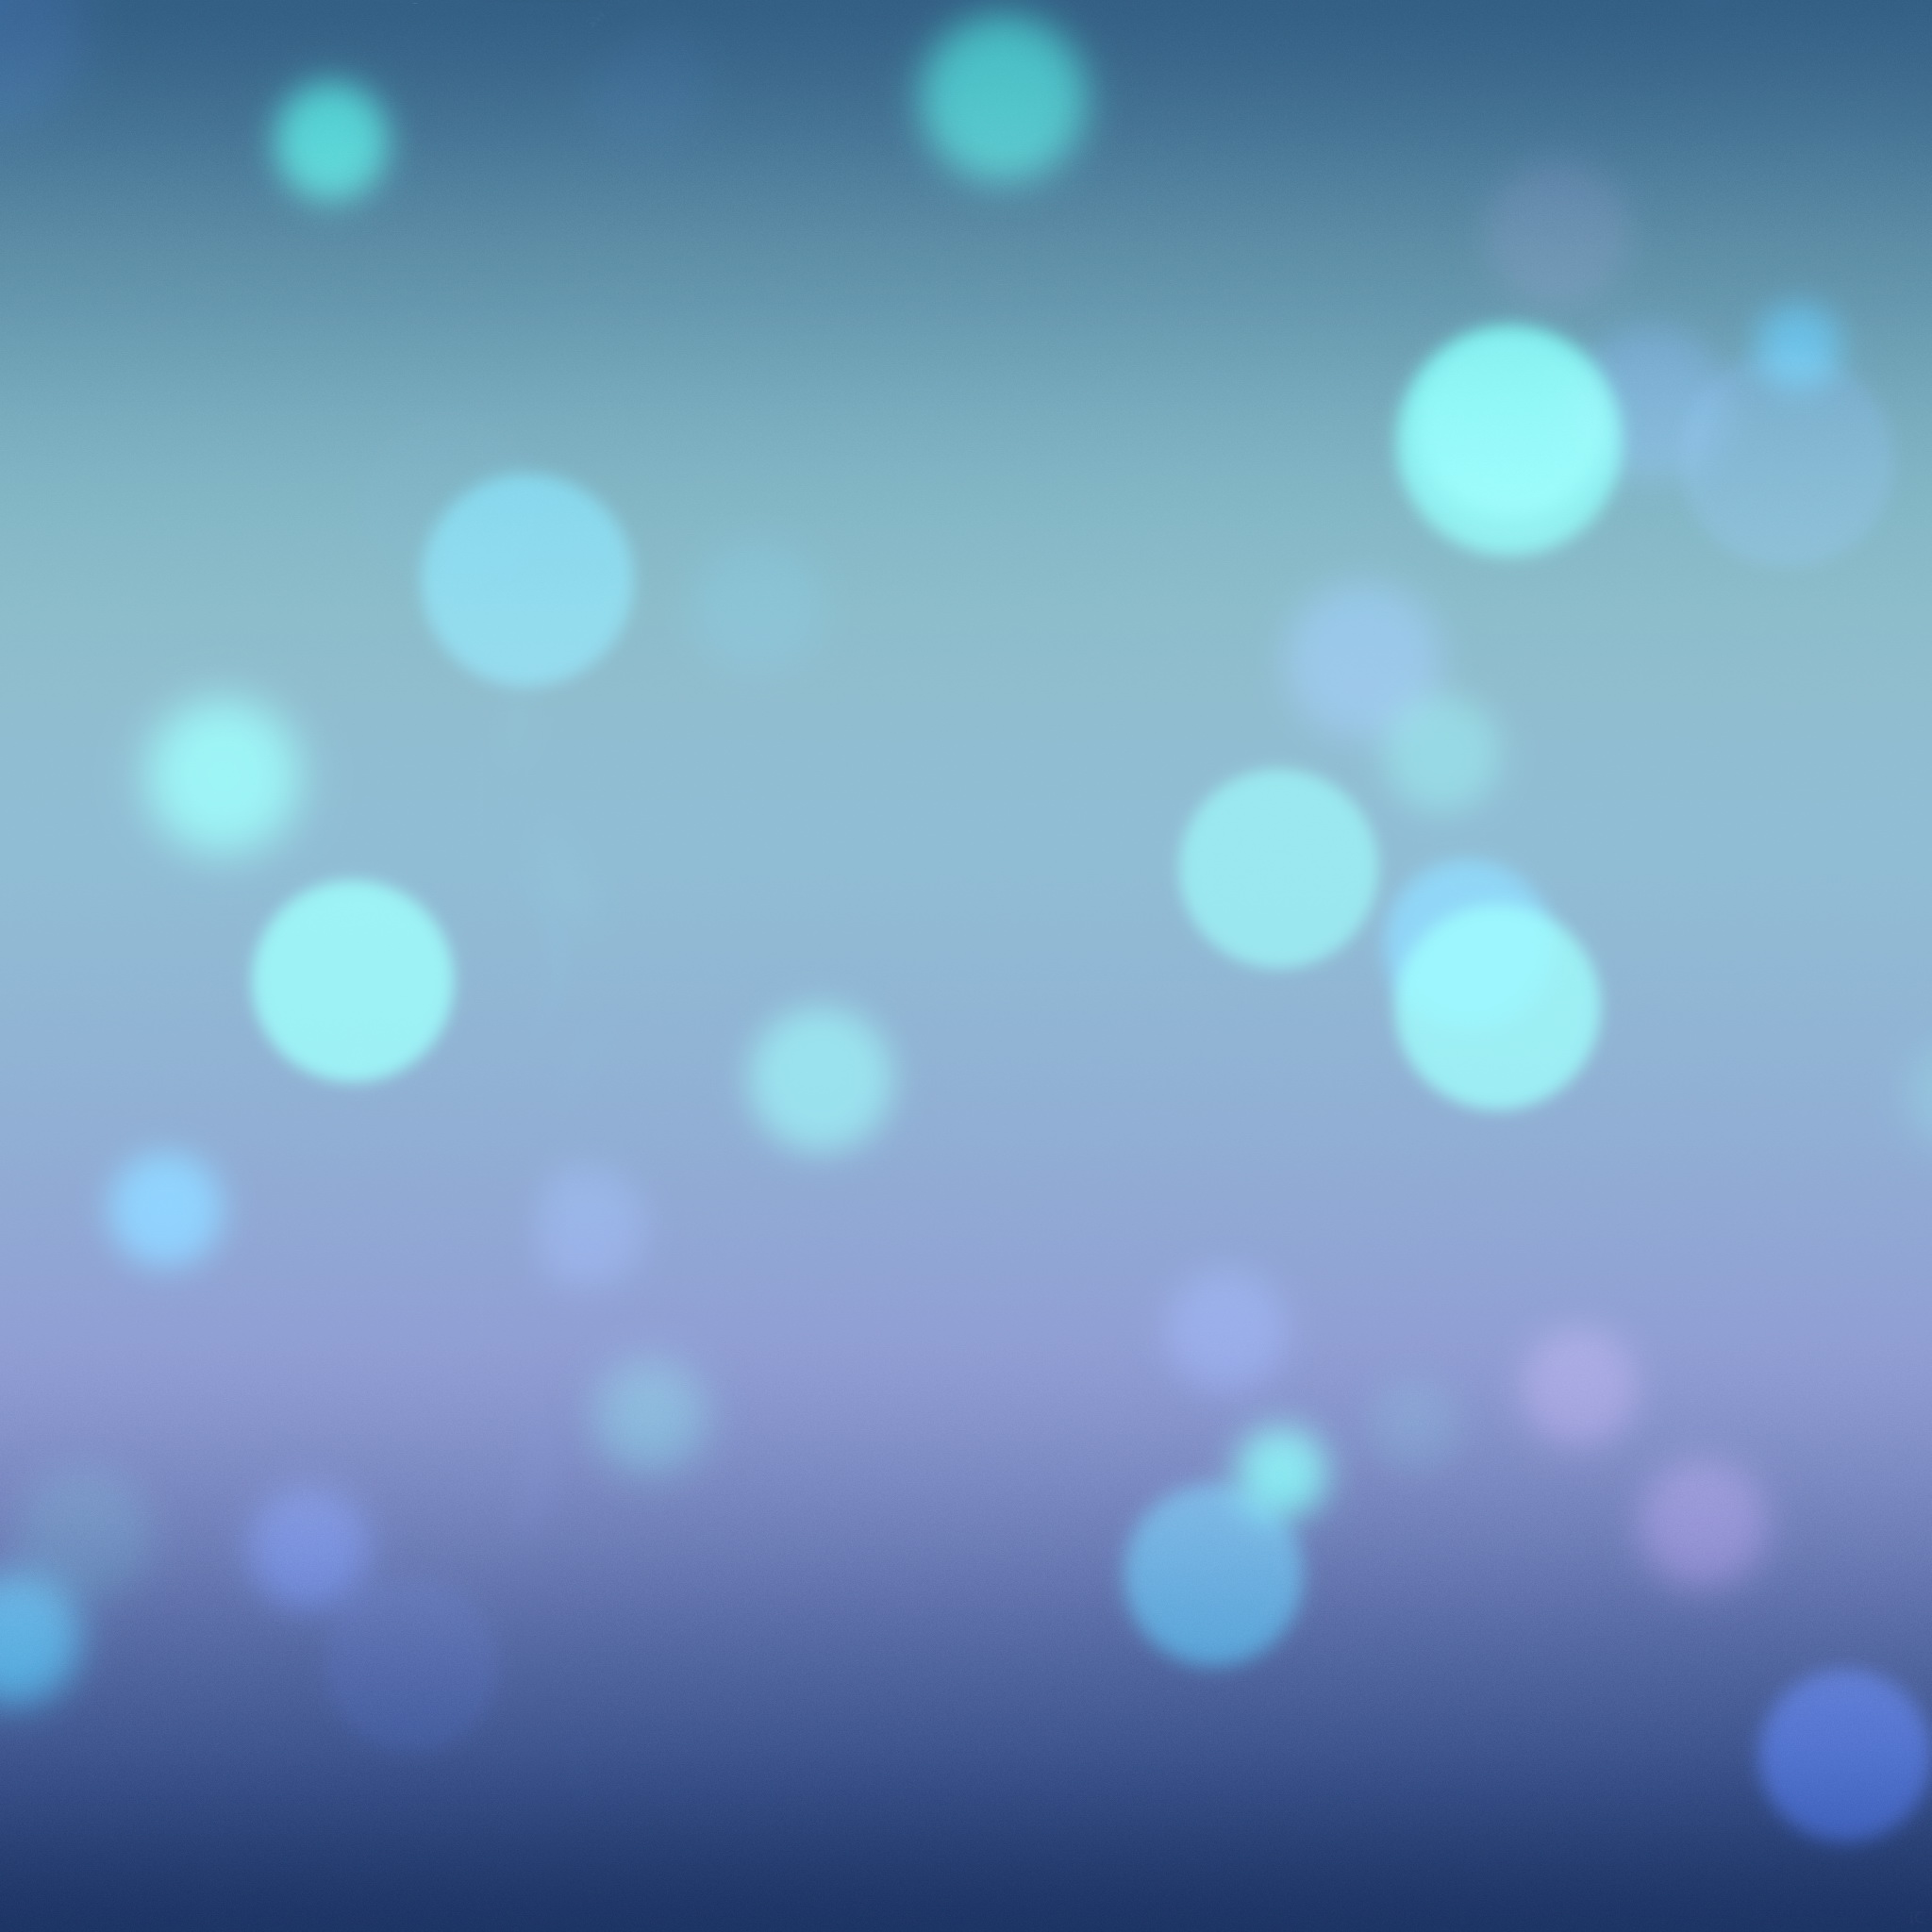 Download Wallpaper Background iOS 7 iPad Gopegocom 2048x2048